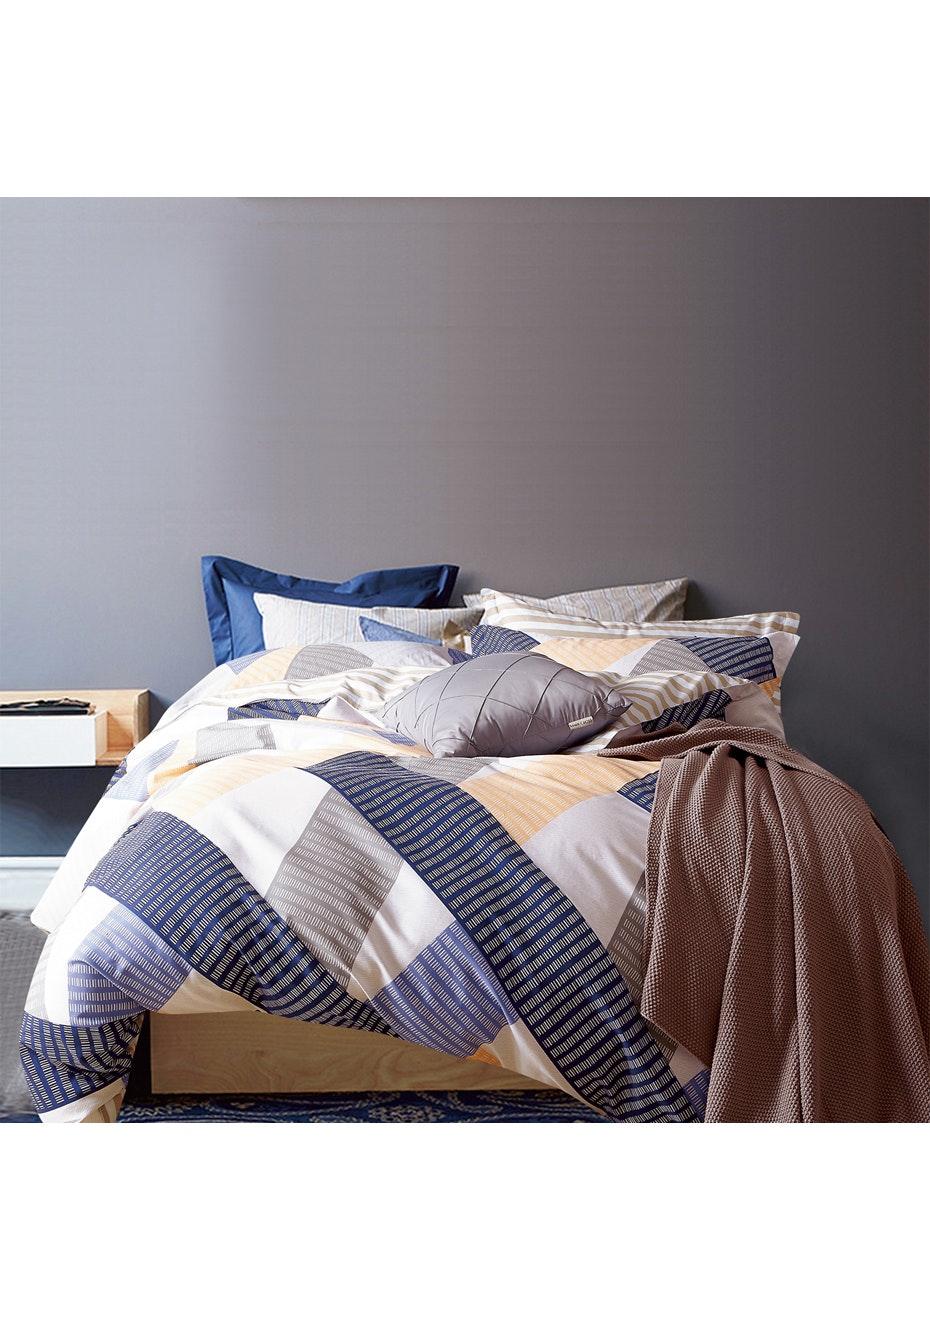 Terrigal Quilt Cover Set - Reversible Design - 100% Cotton - Single Bed